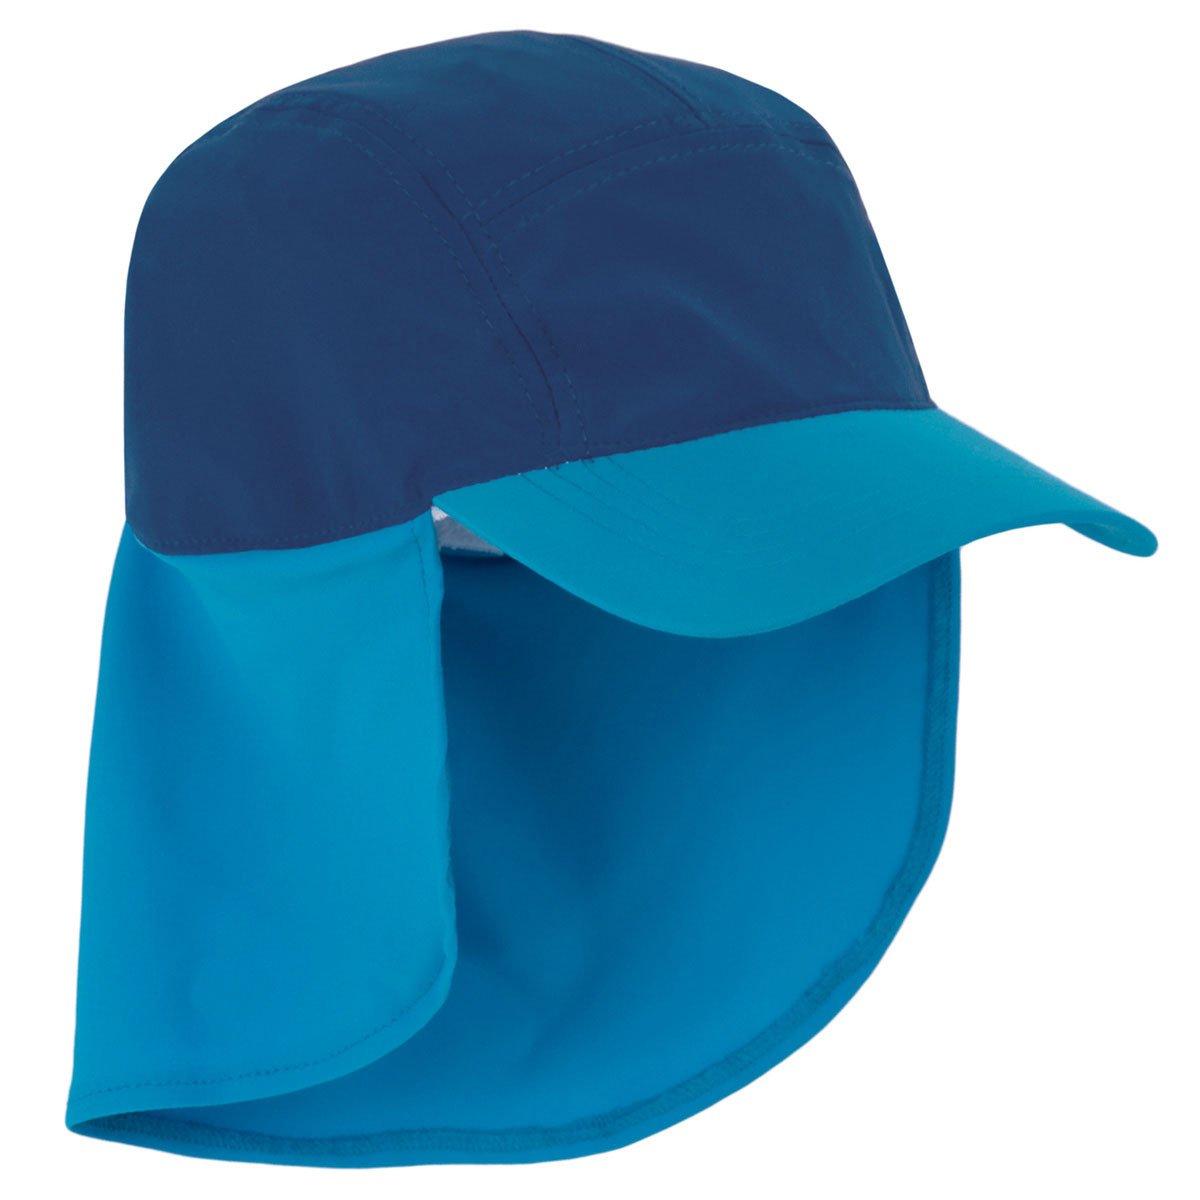 Sun Busters Boys UV Legionnaire Hat Sizes 1-12 Years Tangelo Combo /& Splash Combo UPF50+ Sun Protection